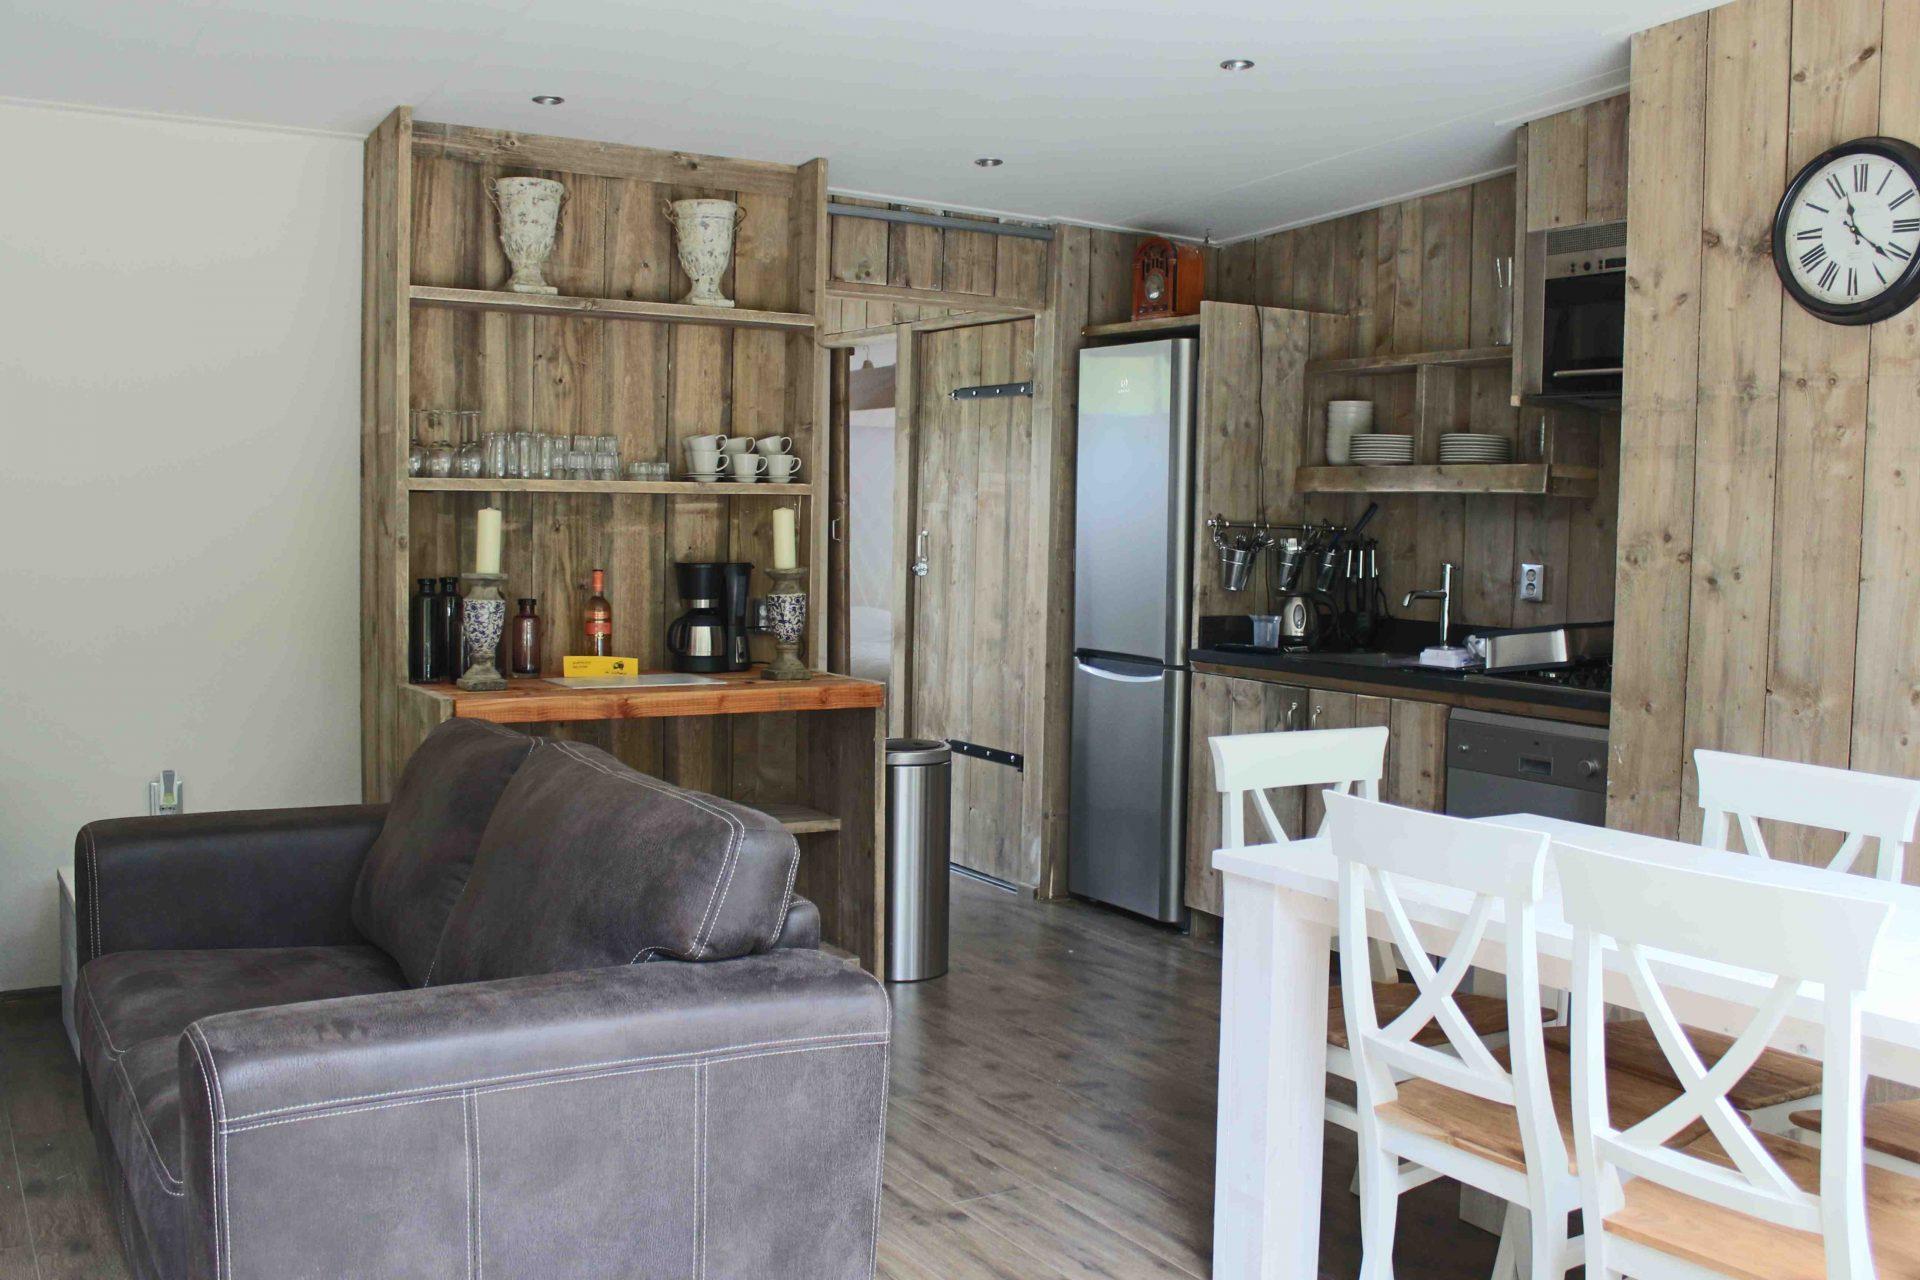 gro e urlaubsfreiheit im ferienhaus holland campings. Black Bedroom Furniture Sets. Home Design Ideas